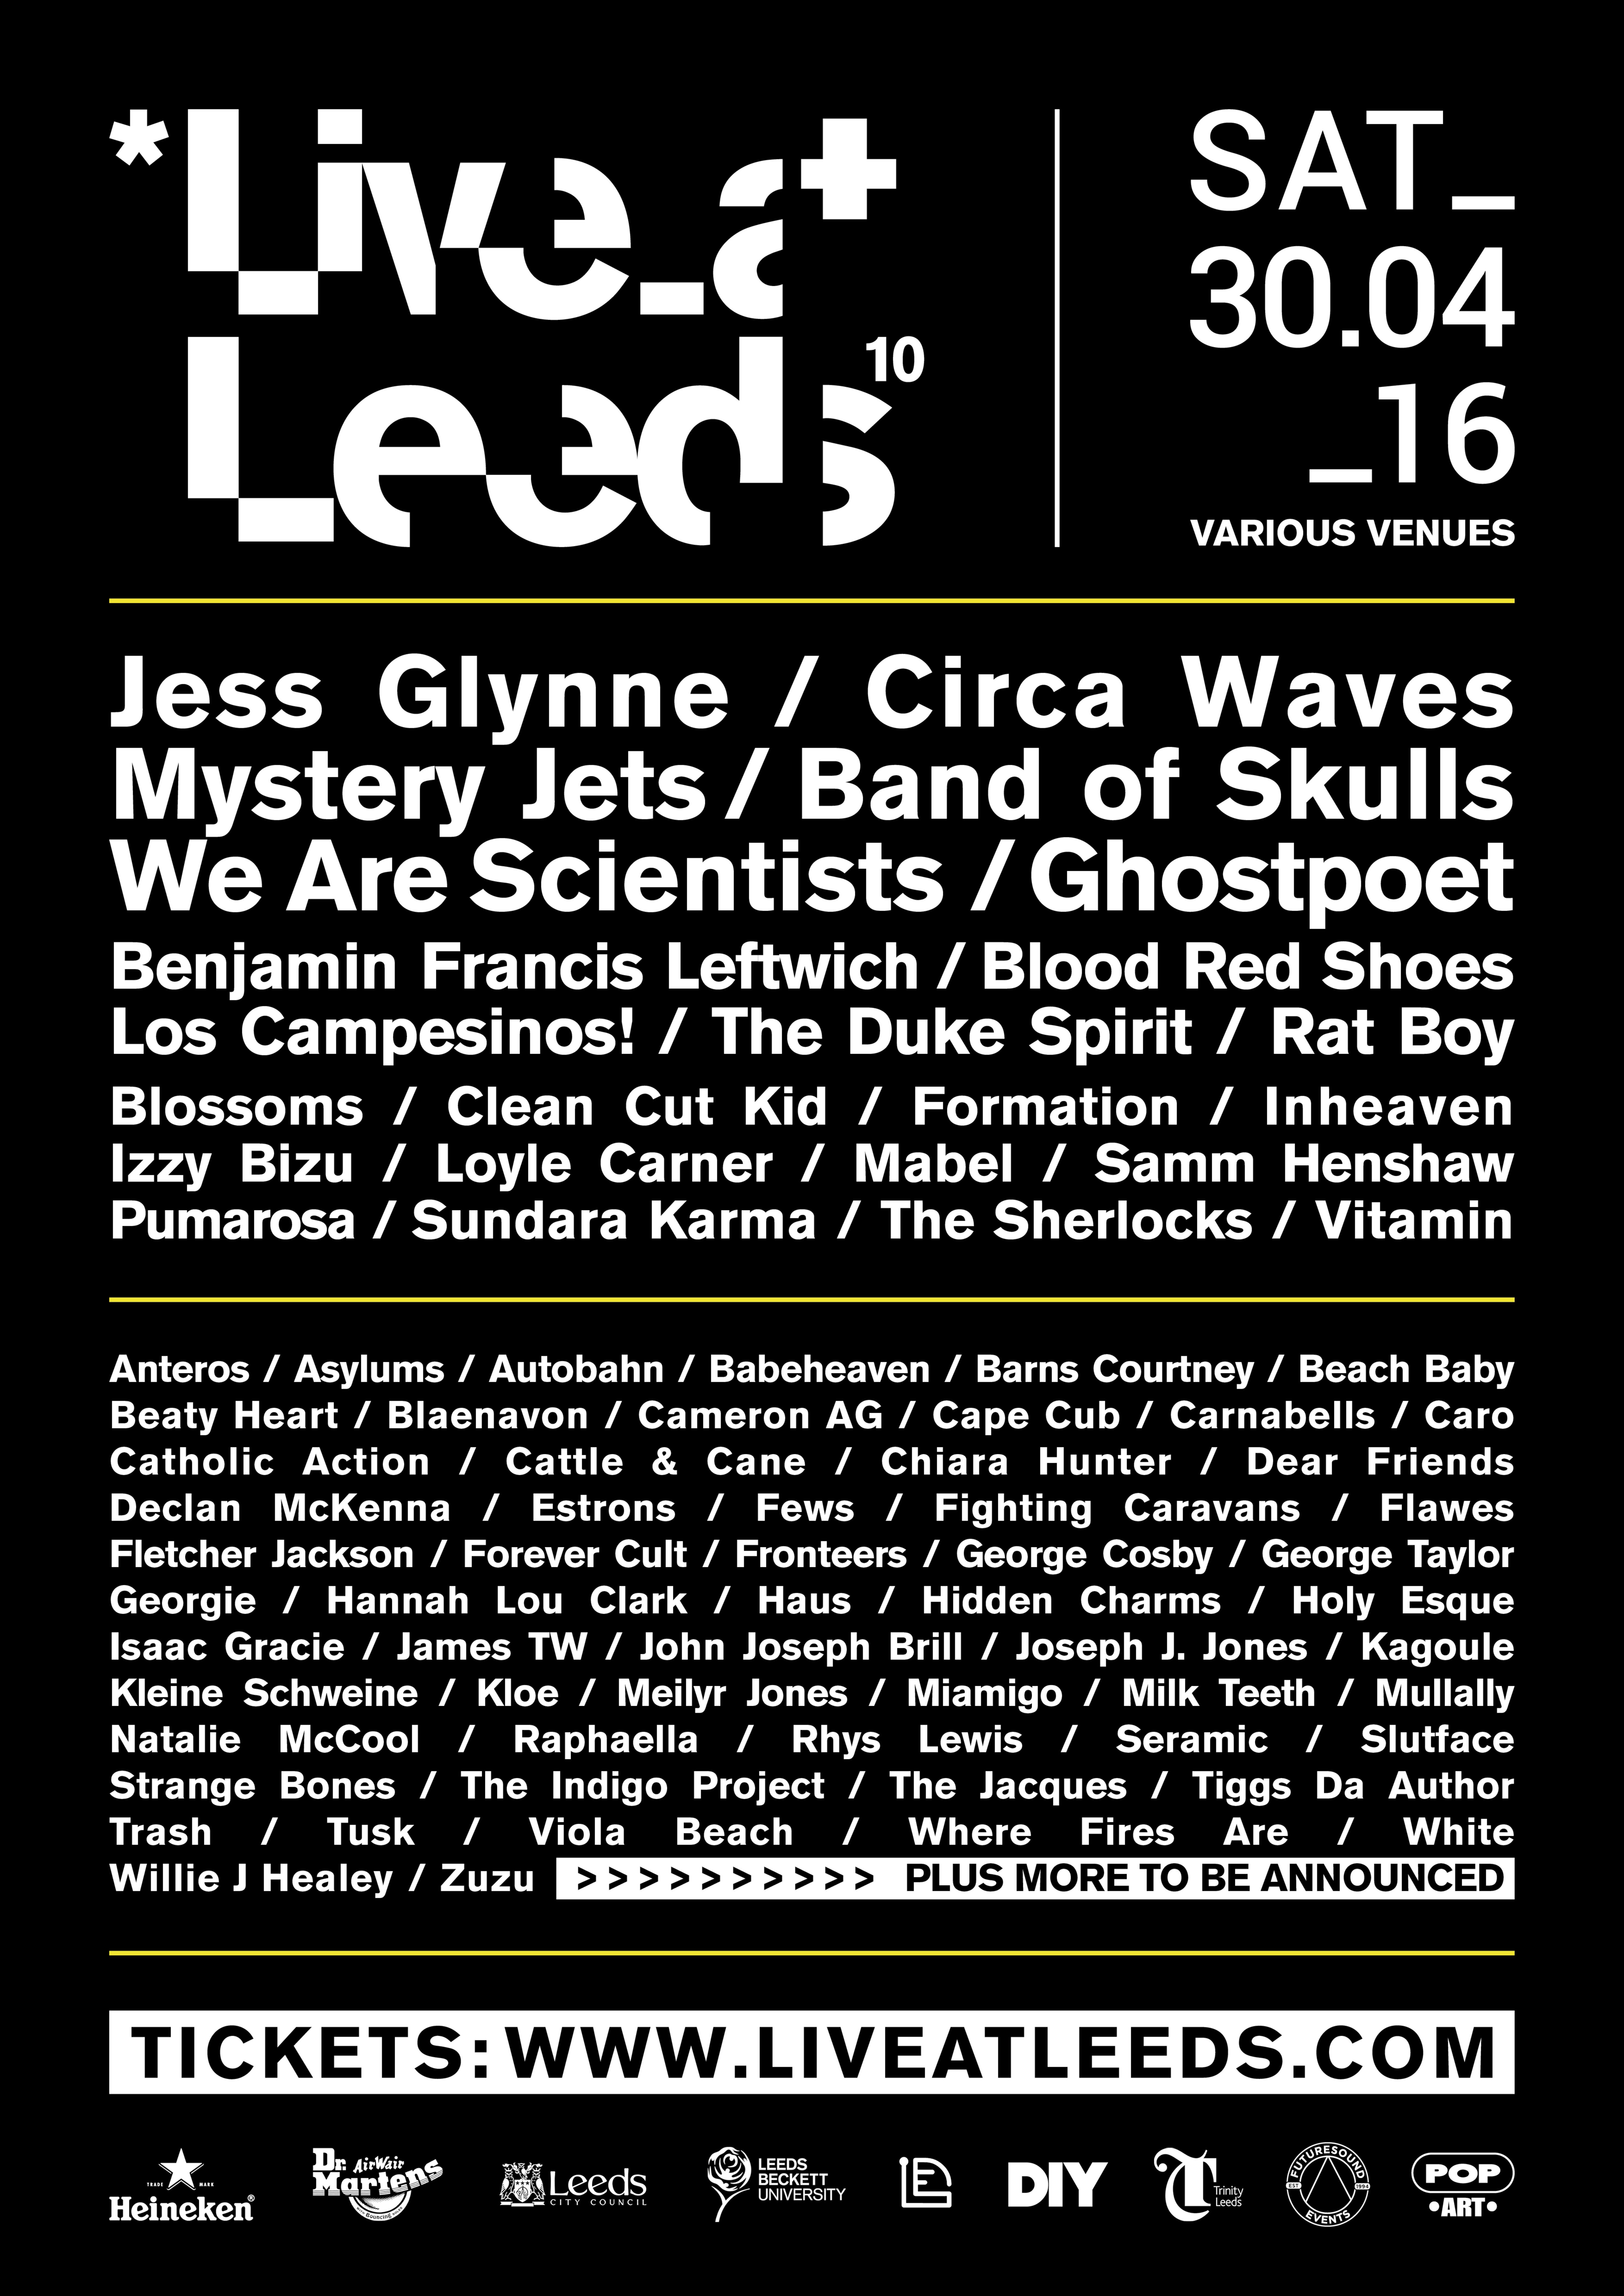 Raphaella - Live At Leeds 2016